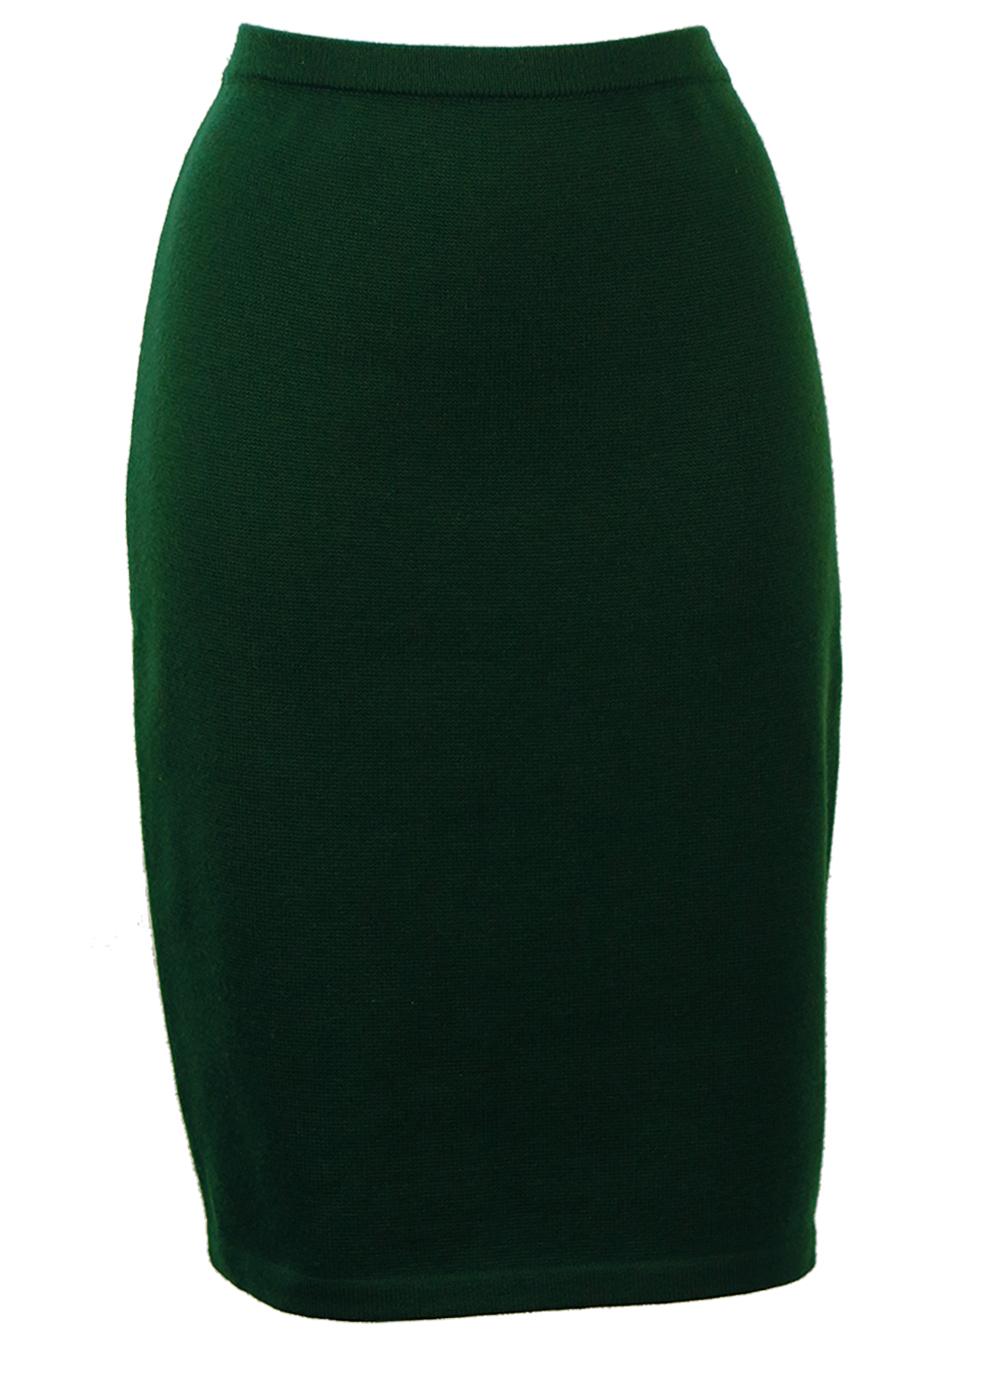 1b8f727ee519 Dark Green Pure Wool Pencil Skirt – M – Reign Vintage